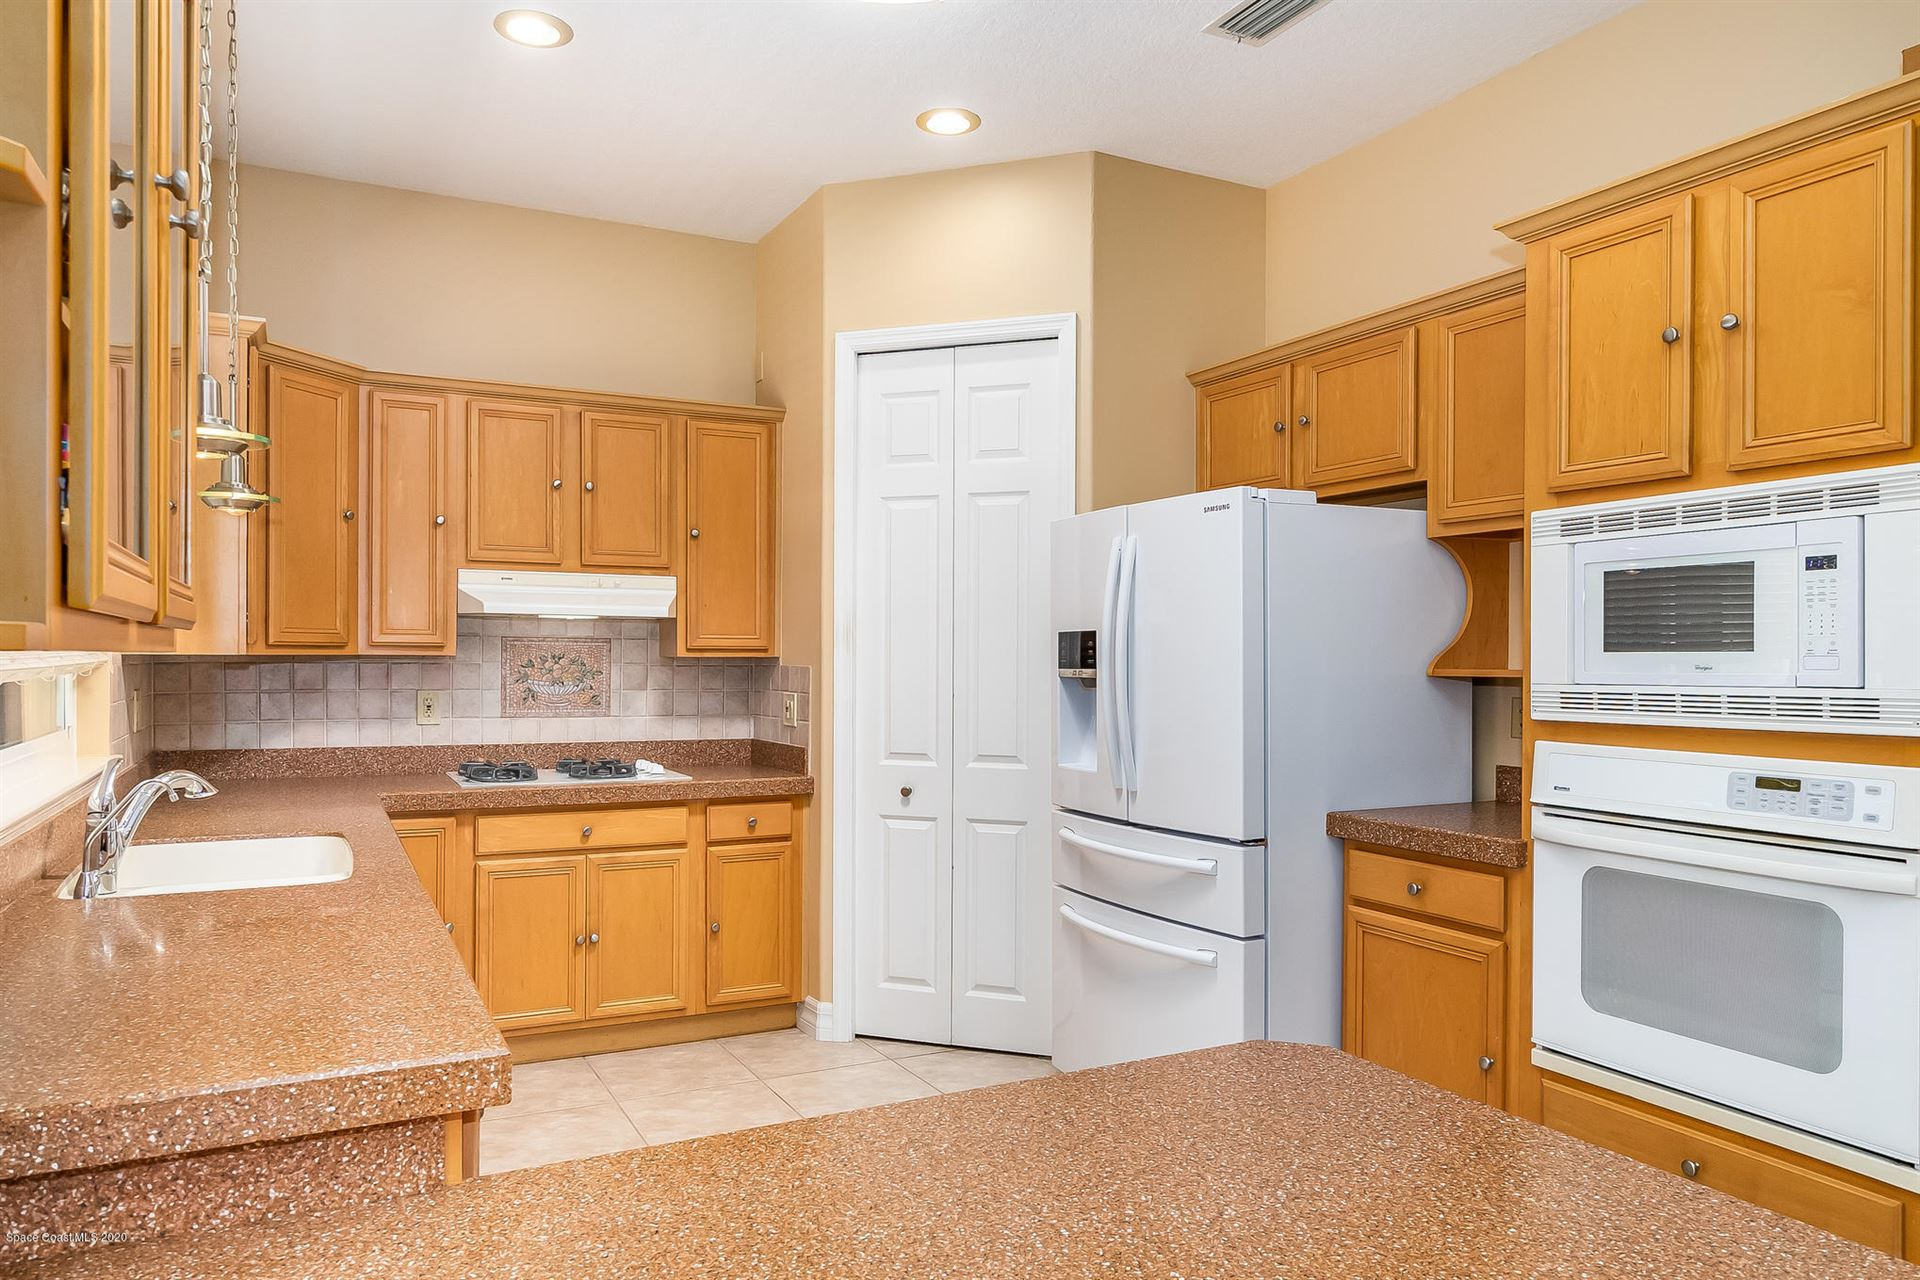 2000 Misty Harbor Place Merritt Island Fl 32952 Mls 874935 Listing Information Real Living Mutter Real Estate Group Real Living Real Estate